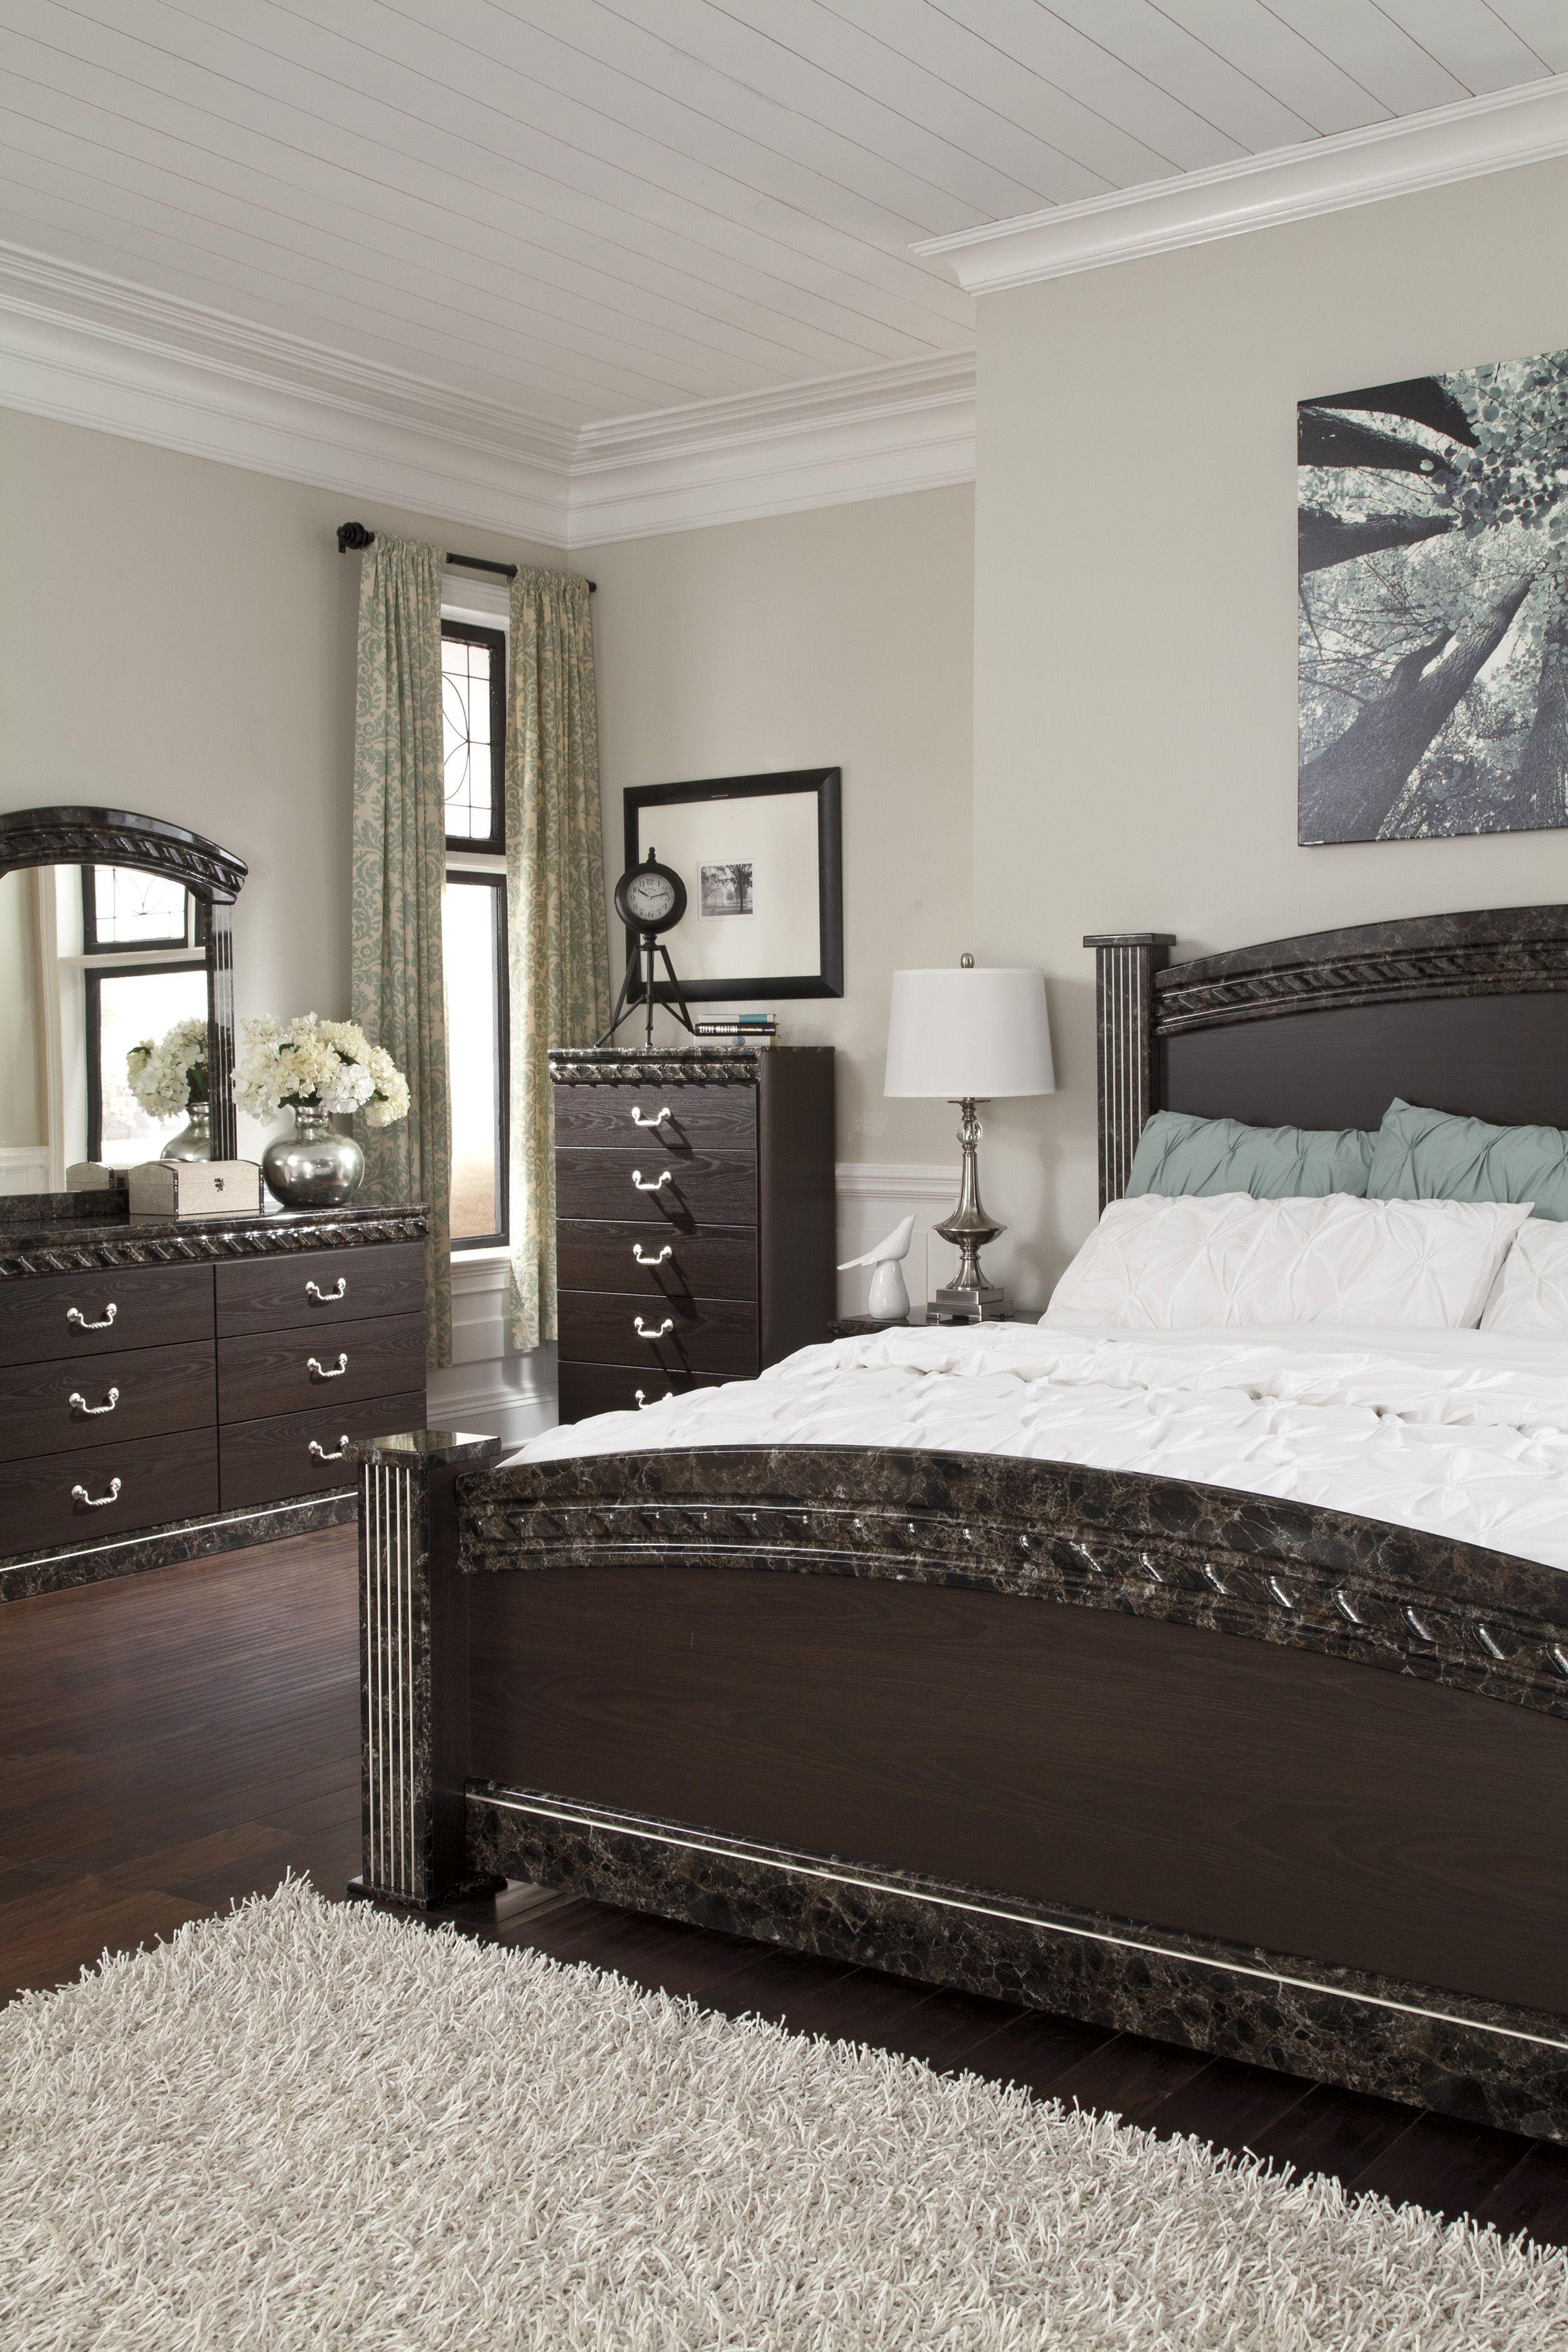 Ashley Vachel 4 Piece King Bedroom Set Homemakers Furniture